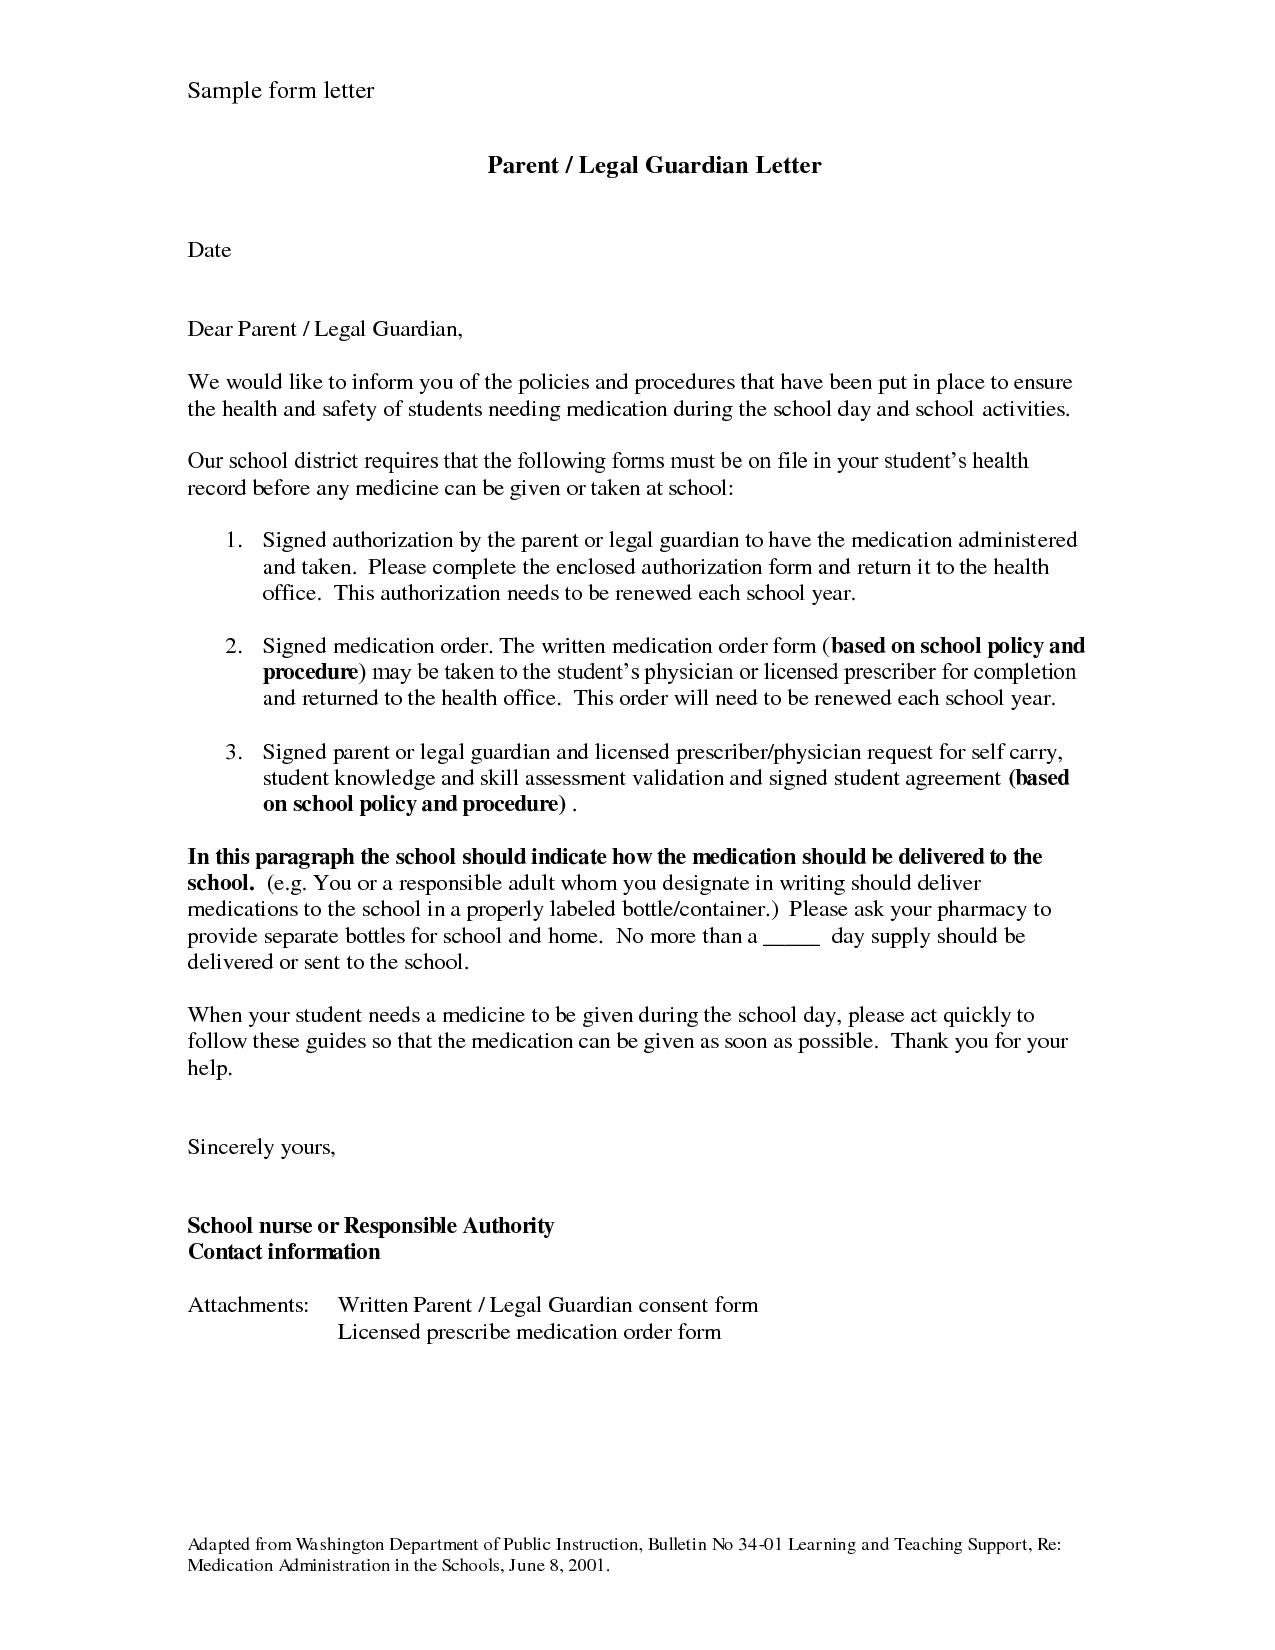 Sample Permanent Guardianship Letter from i.pinimg.com